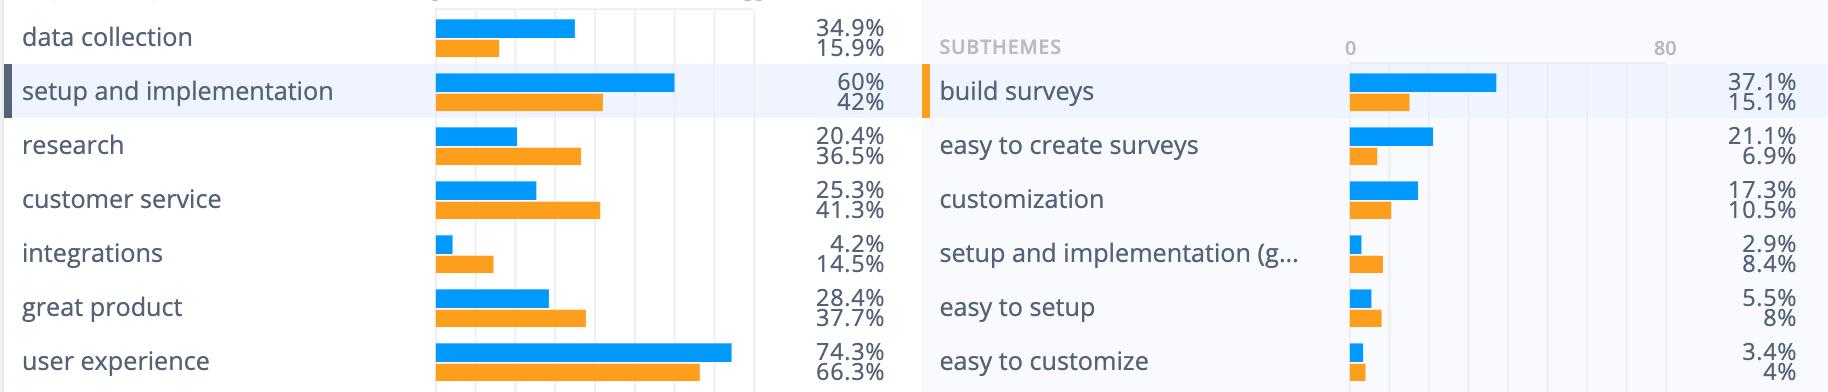 Analysis of survey tools: Users of SurveyMonkey mention setup and implementation positively